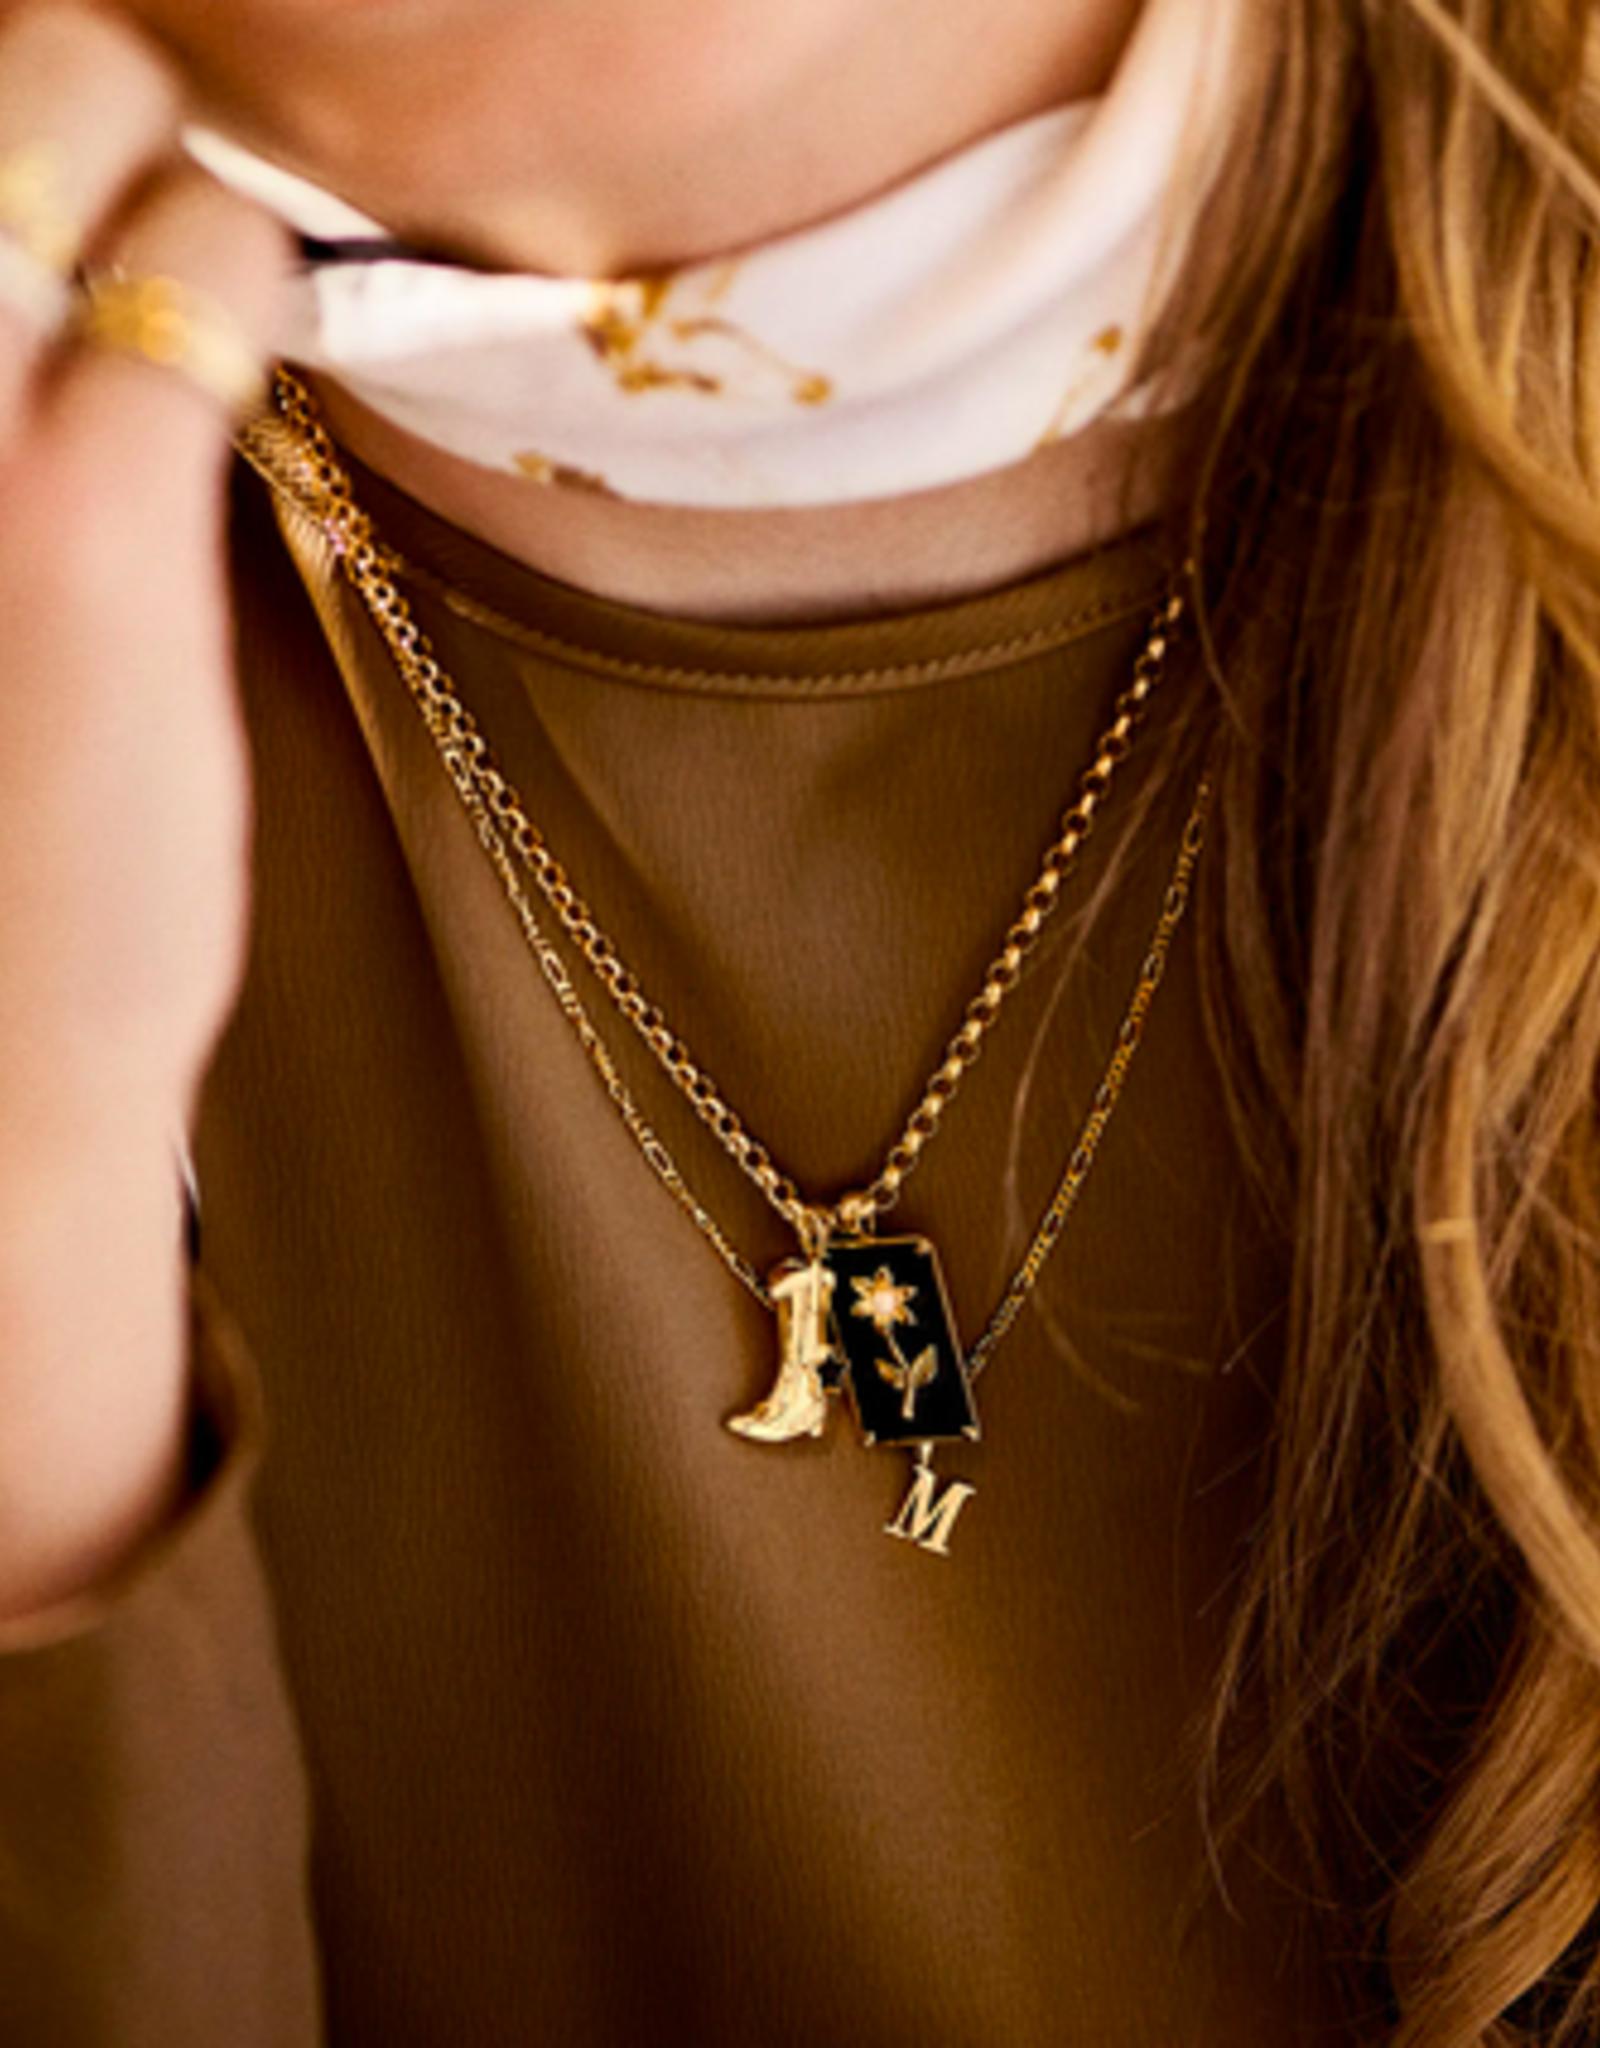 Anna + Nina Cowboy Boot Necklace Charm Silver